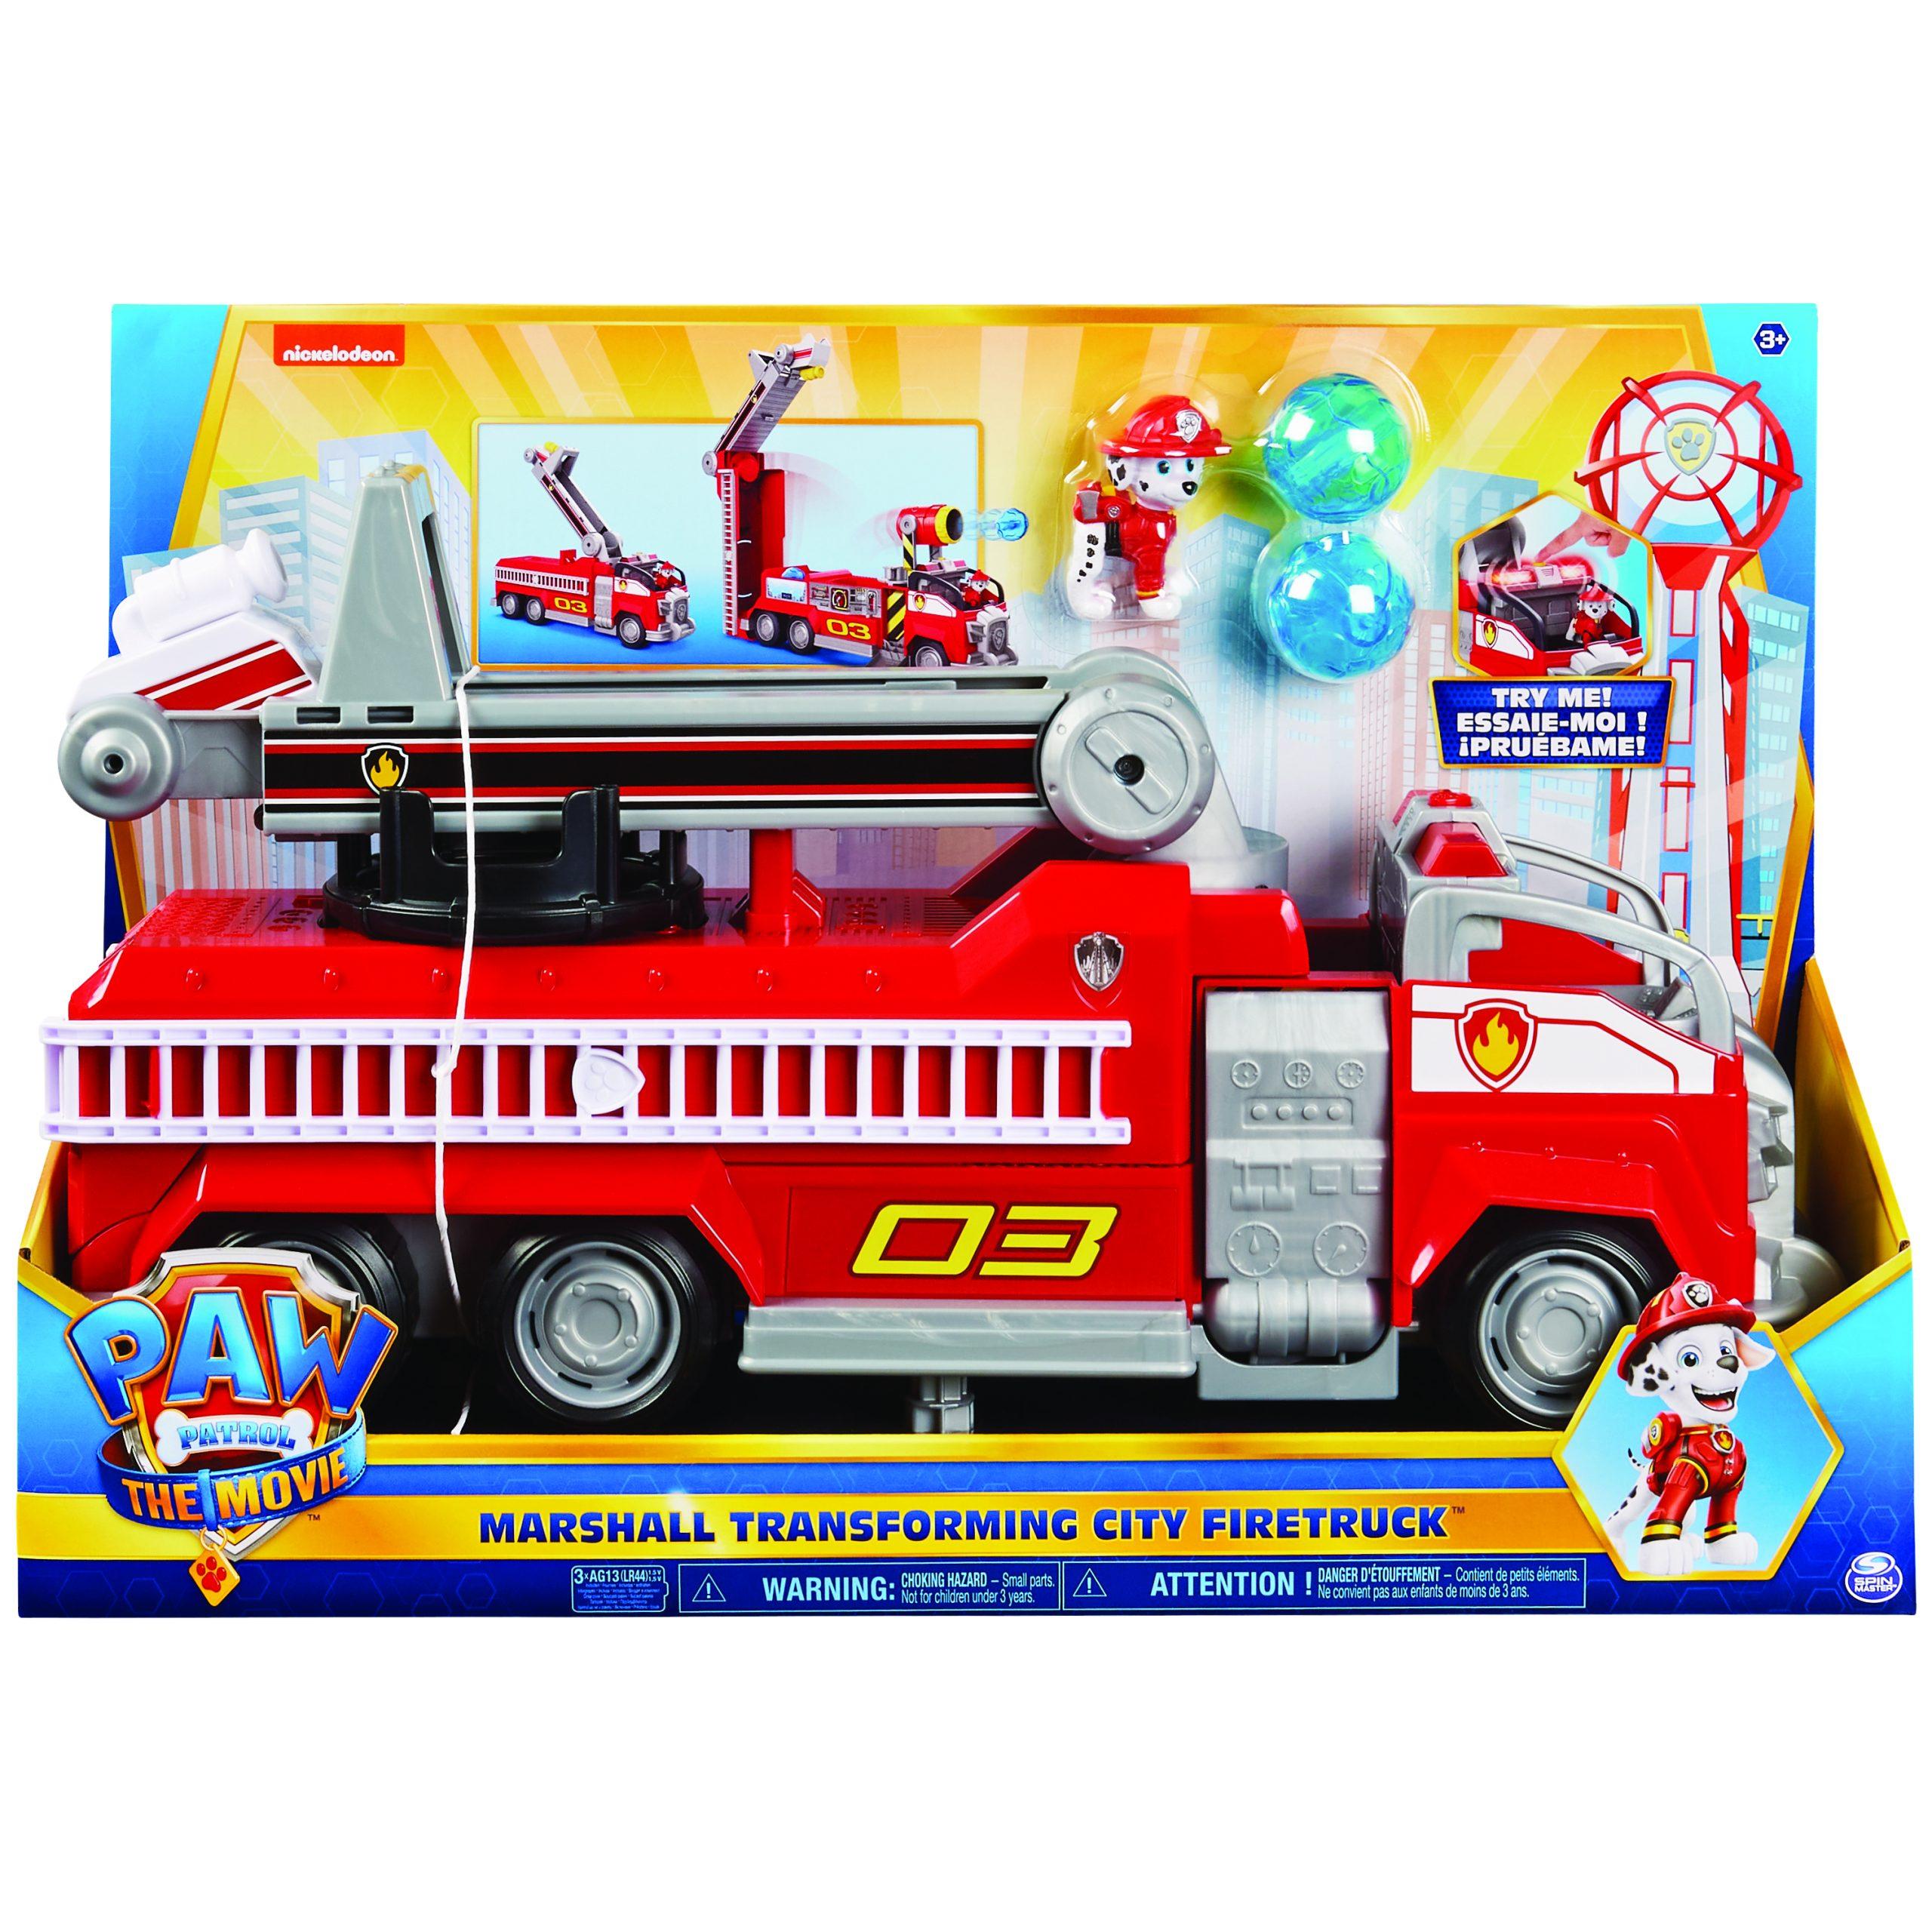 Marshall's Transforming City Fire Truck™